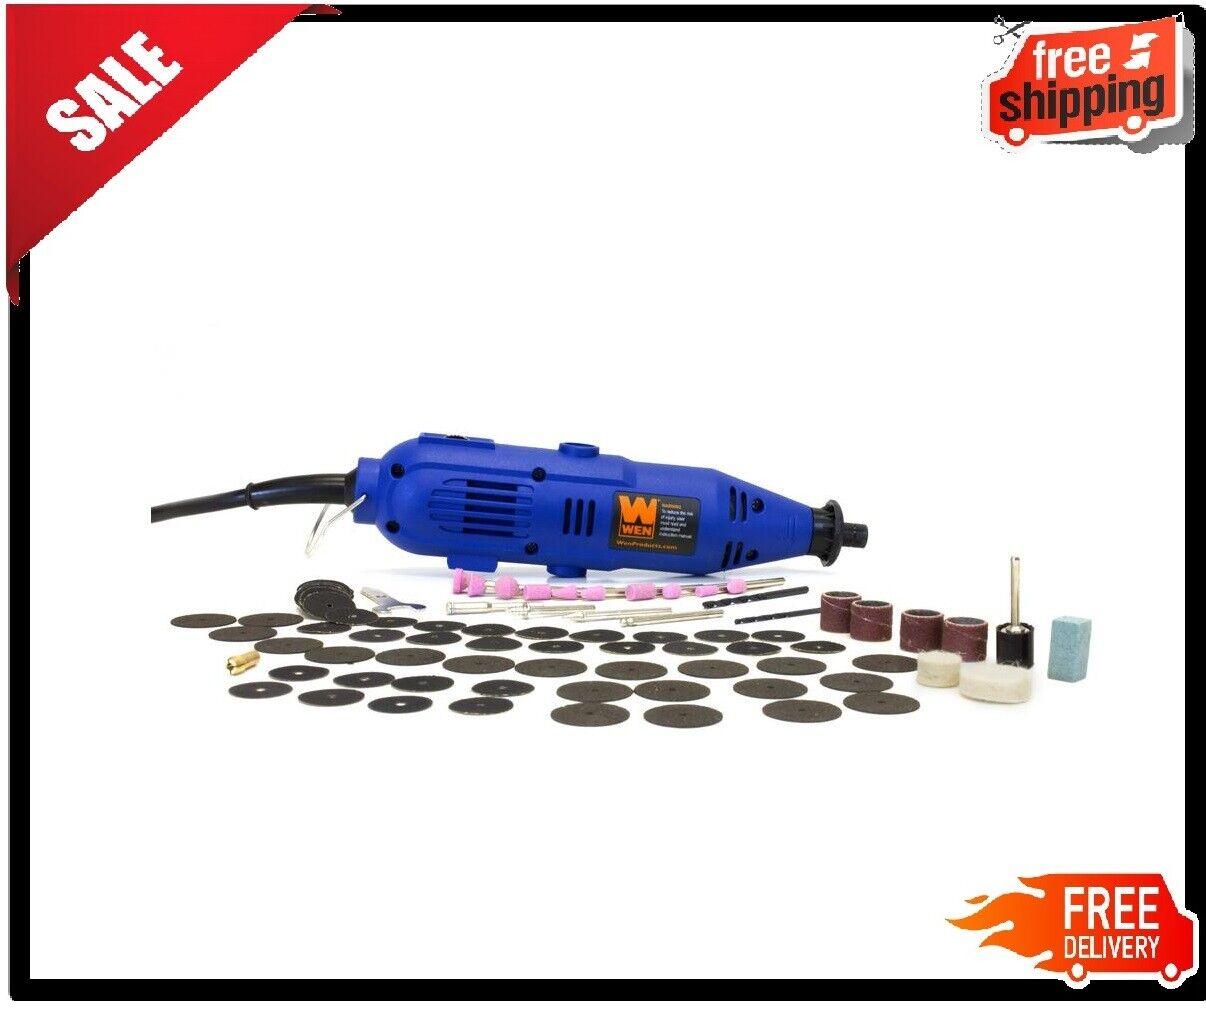 100-Piece WEN Variable Speed Rotary Tool Kit Dremel Rotary G